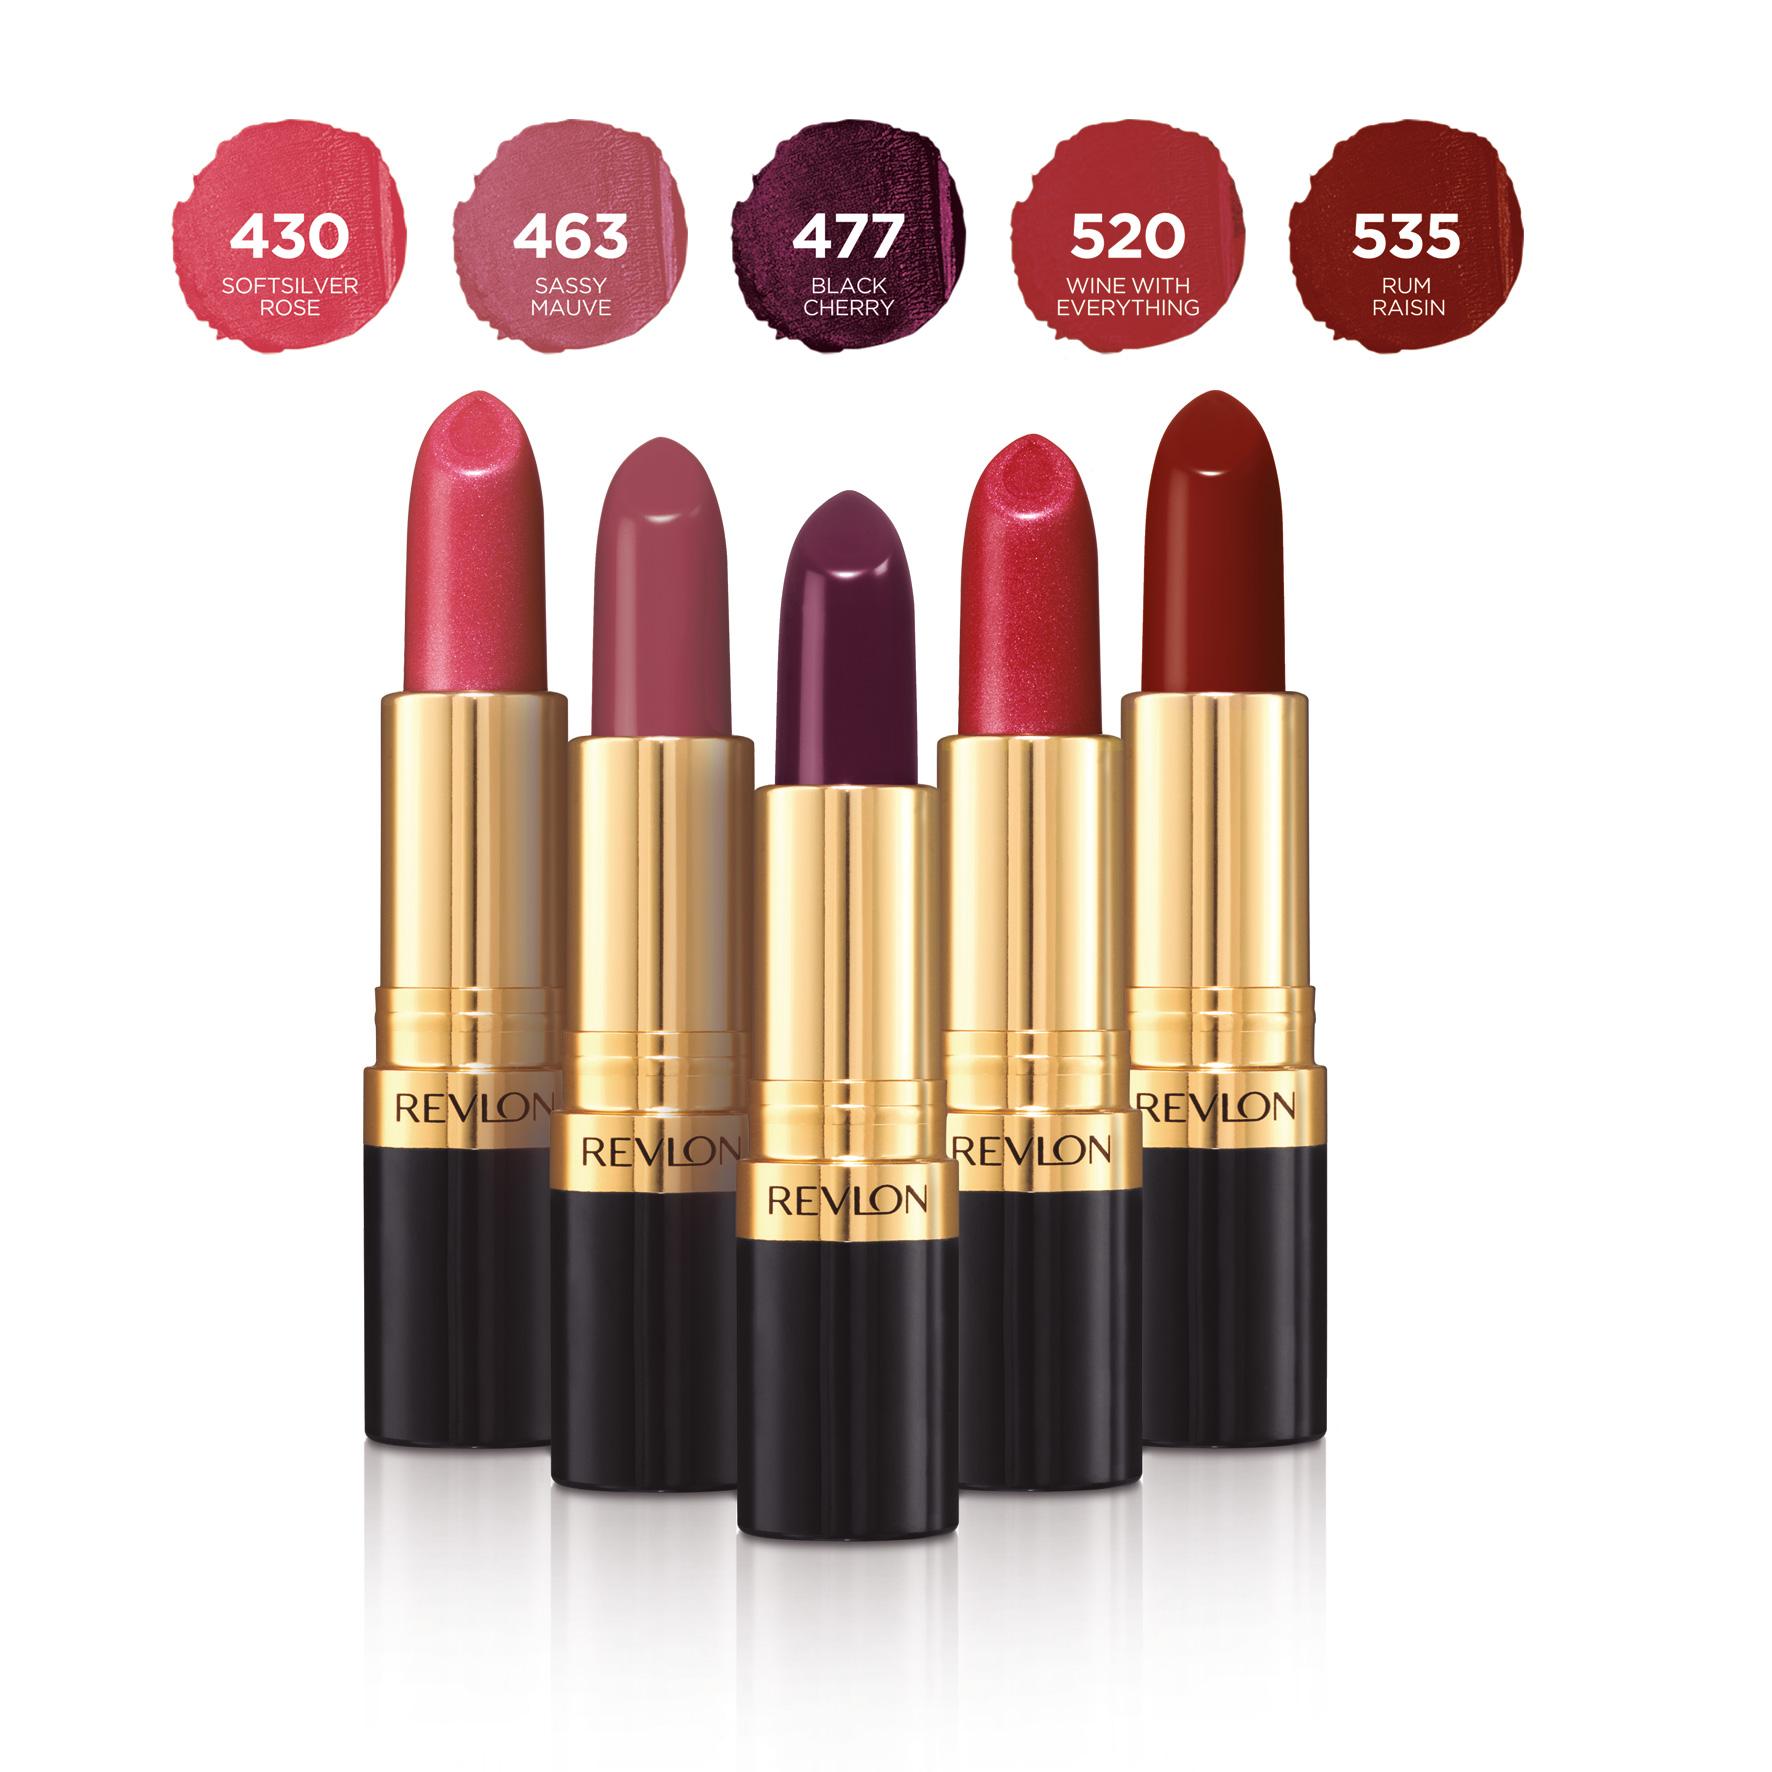 revlon_cosmetics_WRLC508700.jpg